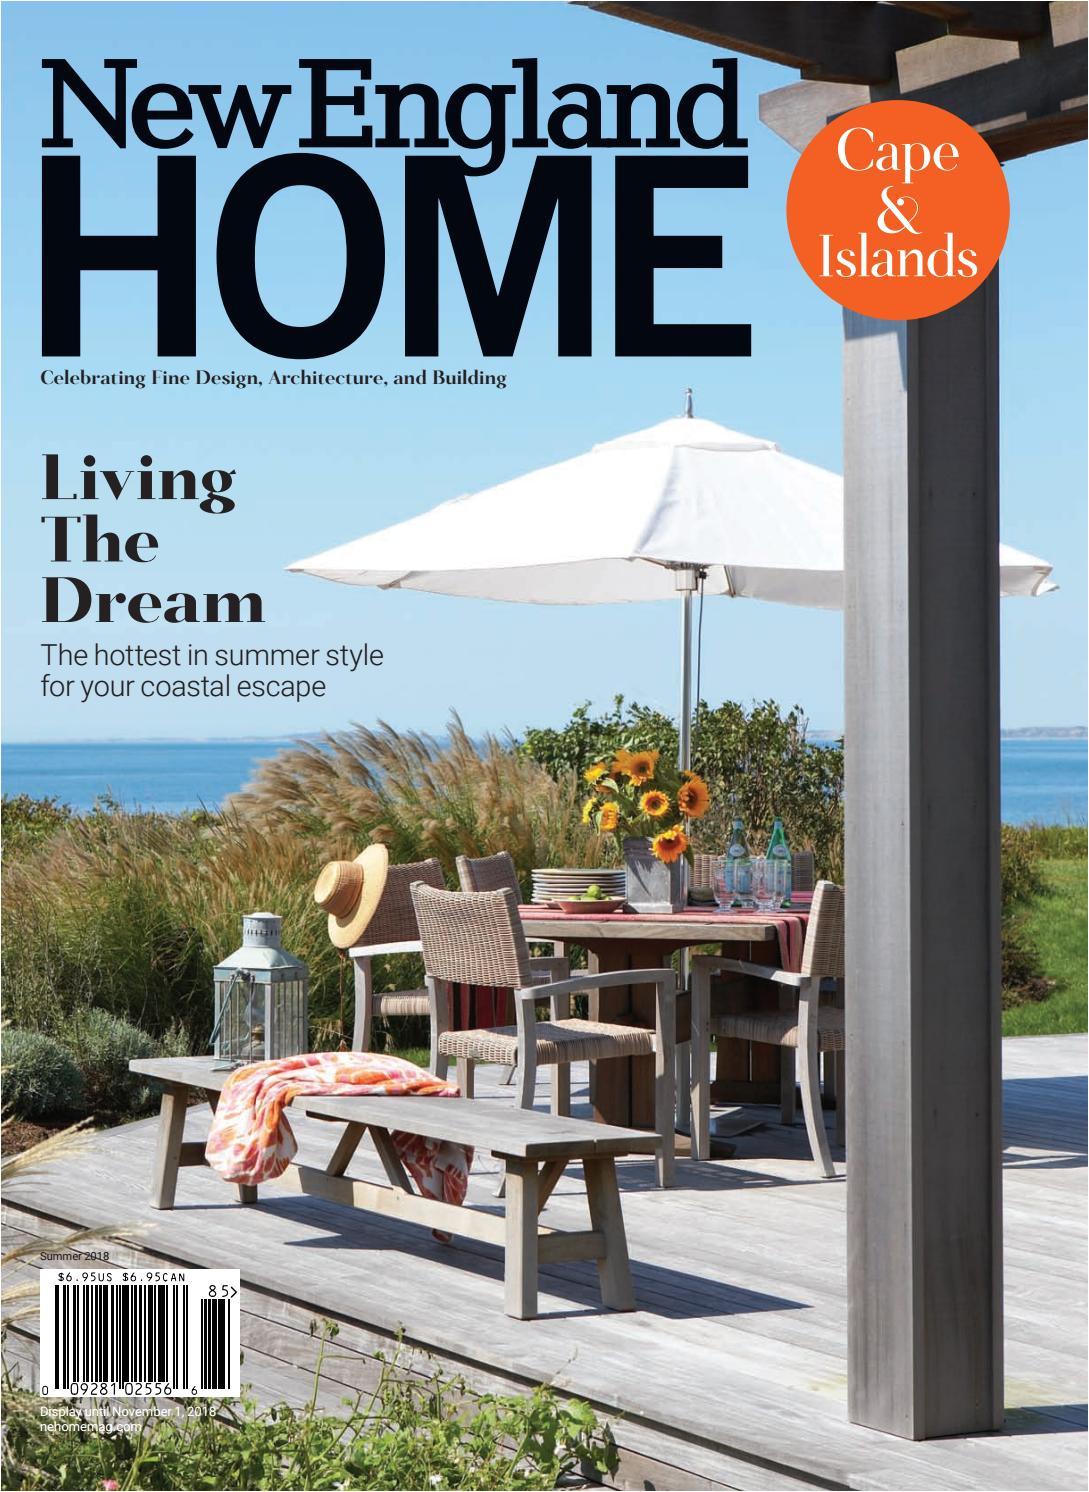 new england home cape and islands 2018 by new england home magazine llc issuu